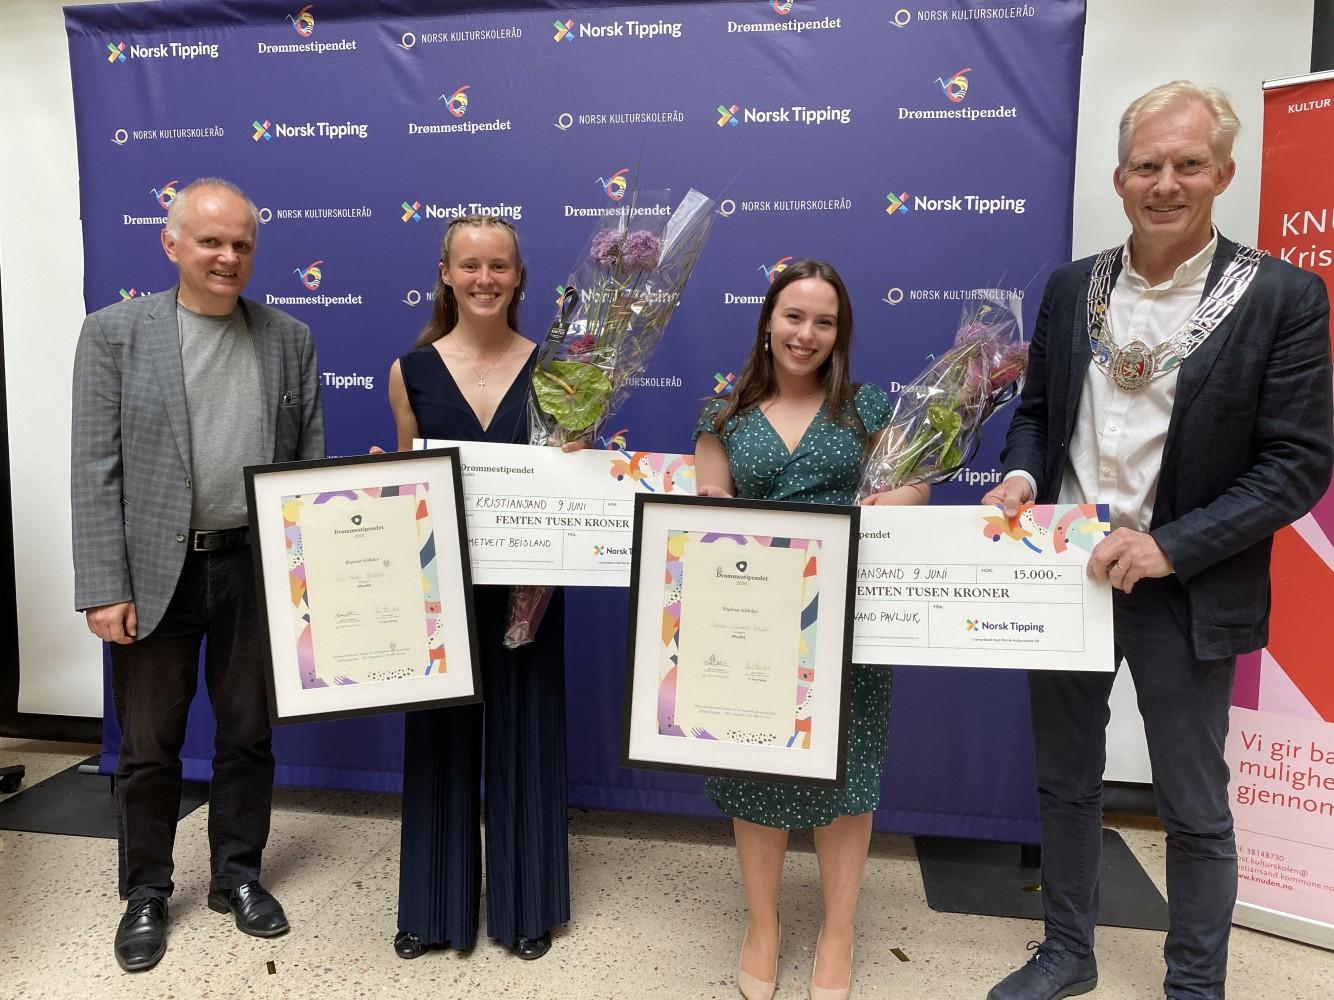 Drømmestipendvinnerne, rektor og ordfører smilende foran Norsk tipping-vegg